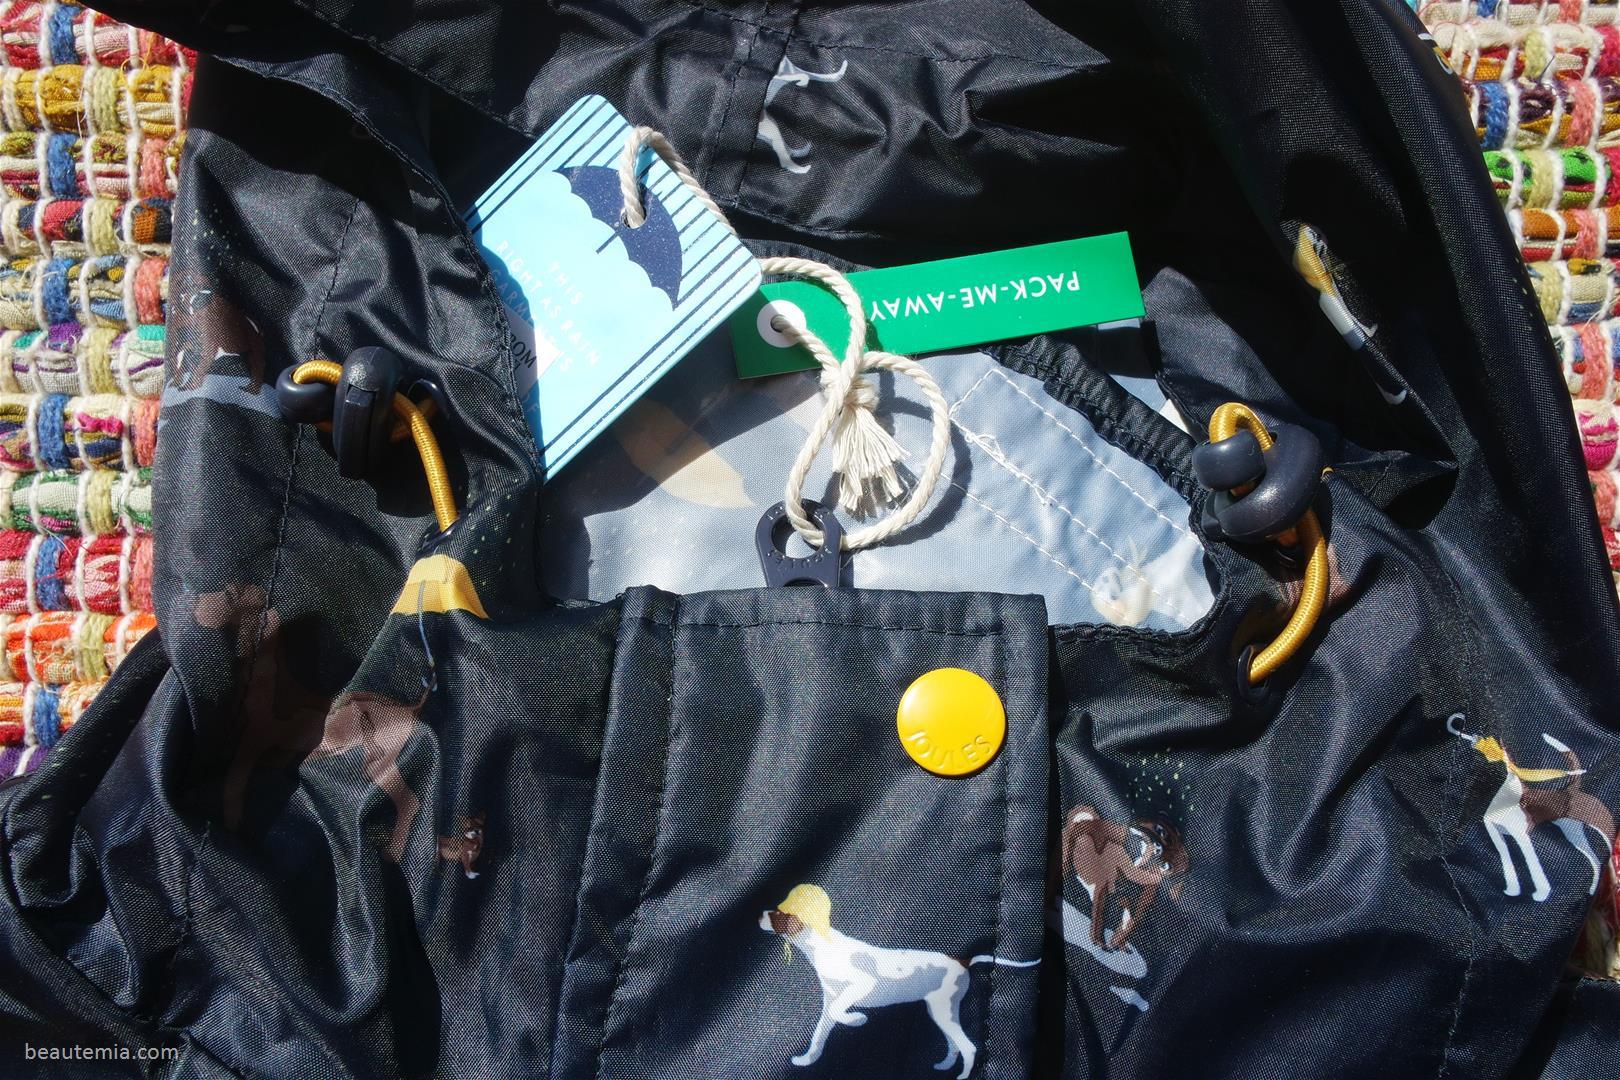 Joules Right as Rain Dog Print Hooded Raincoat, Joules rain boots, Joules raincoat, Hunter boots, Hunter rainboots, luxury rainboots, Hunter rain coat, best raincoat, Patagonia jackets, vegan raincoat & Northface raincoat